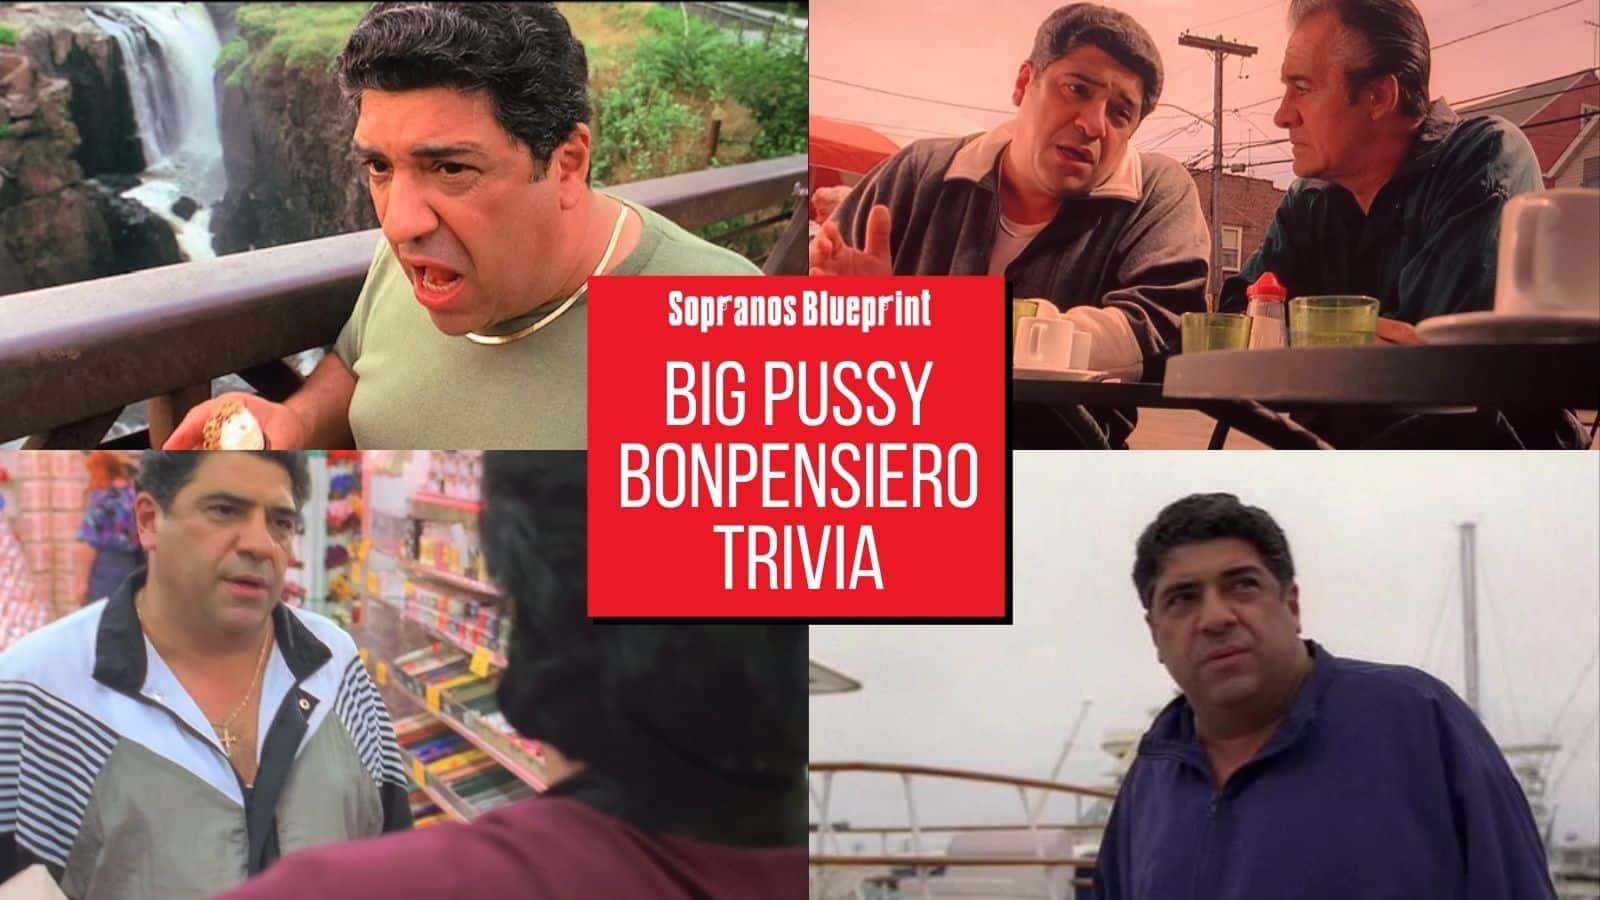 sal big pussy bonpensiero trivia cover page